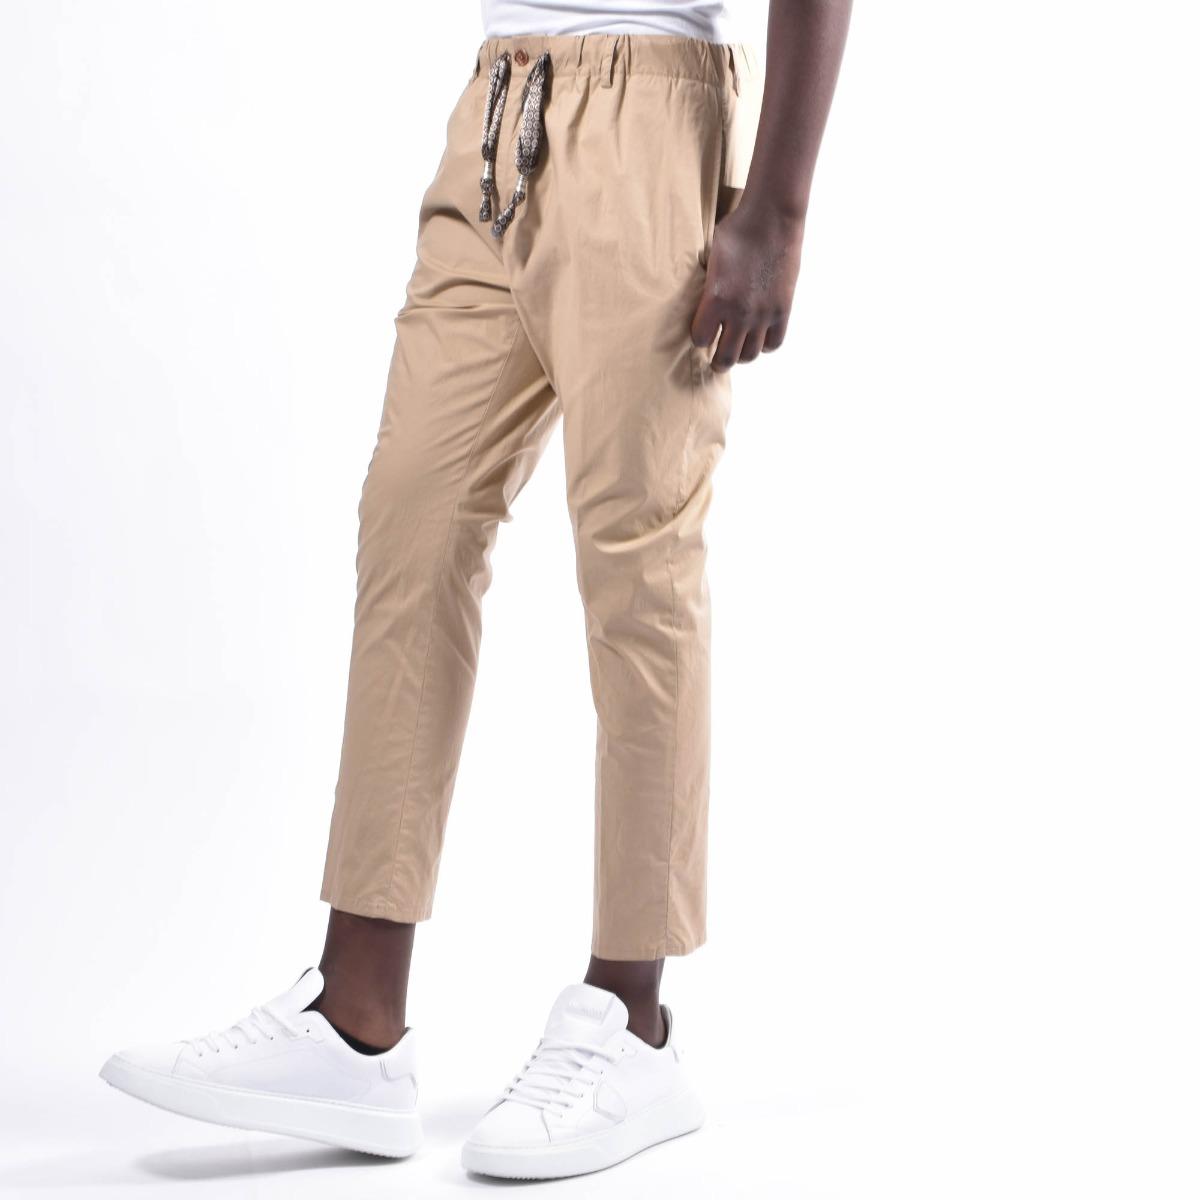 Pantalone levrero 95 foulard - Sabbia